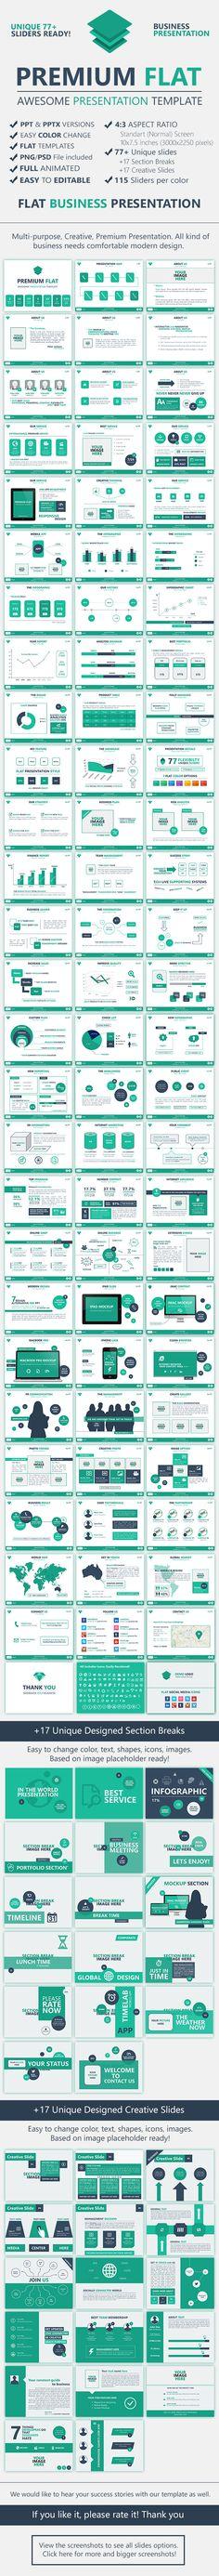 Premium FLAT-Multipurpose, Creative Presentation - Business Powerpoint Templates